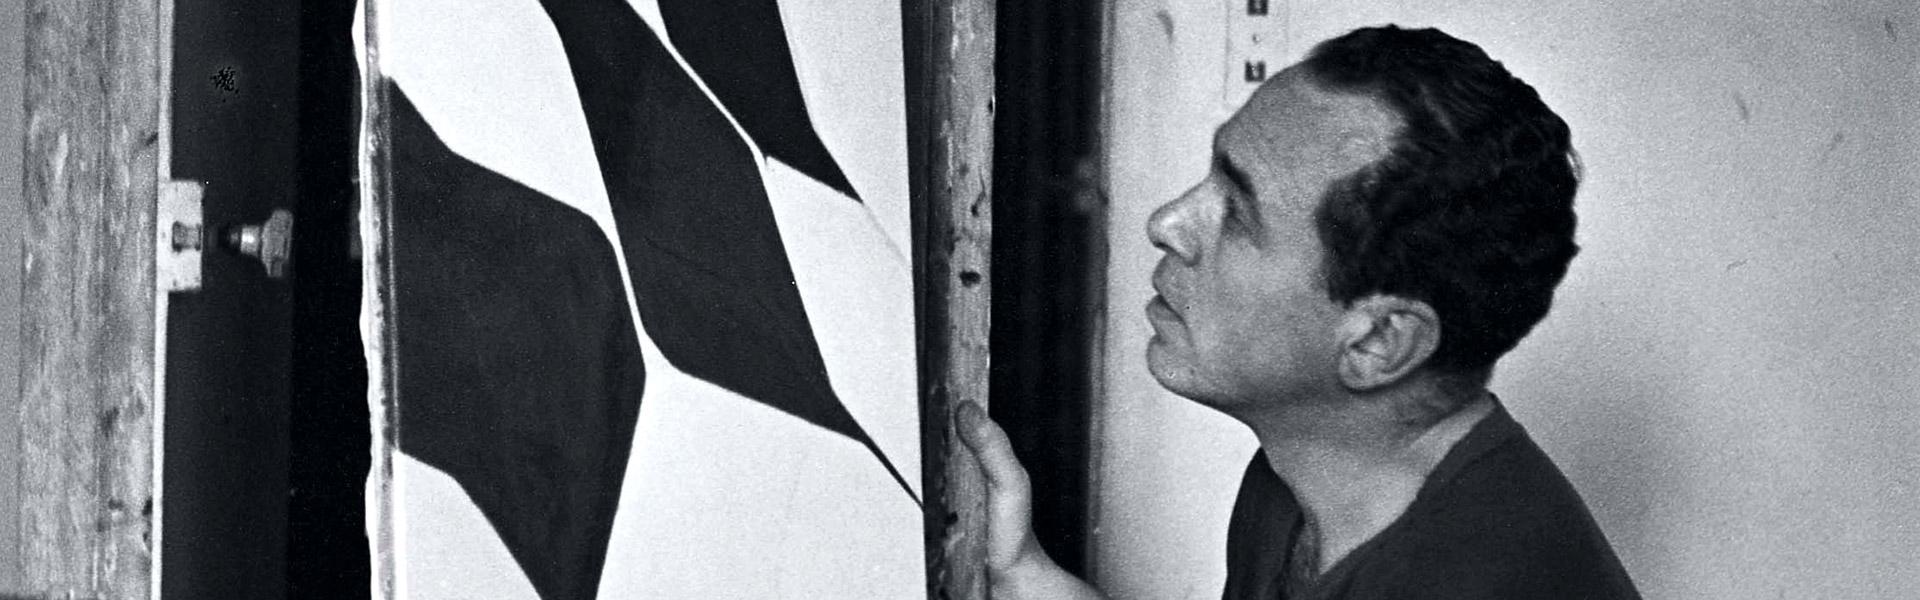 Pablo Palazuelo | Artistas | Guggenheim Bilbao Museoa